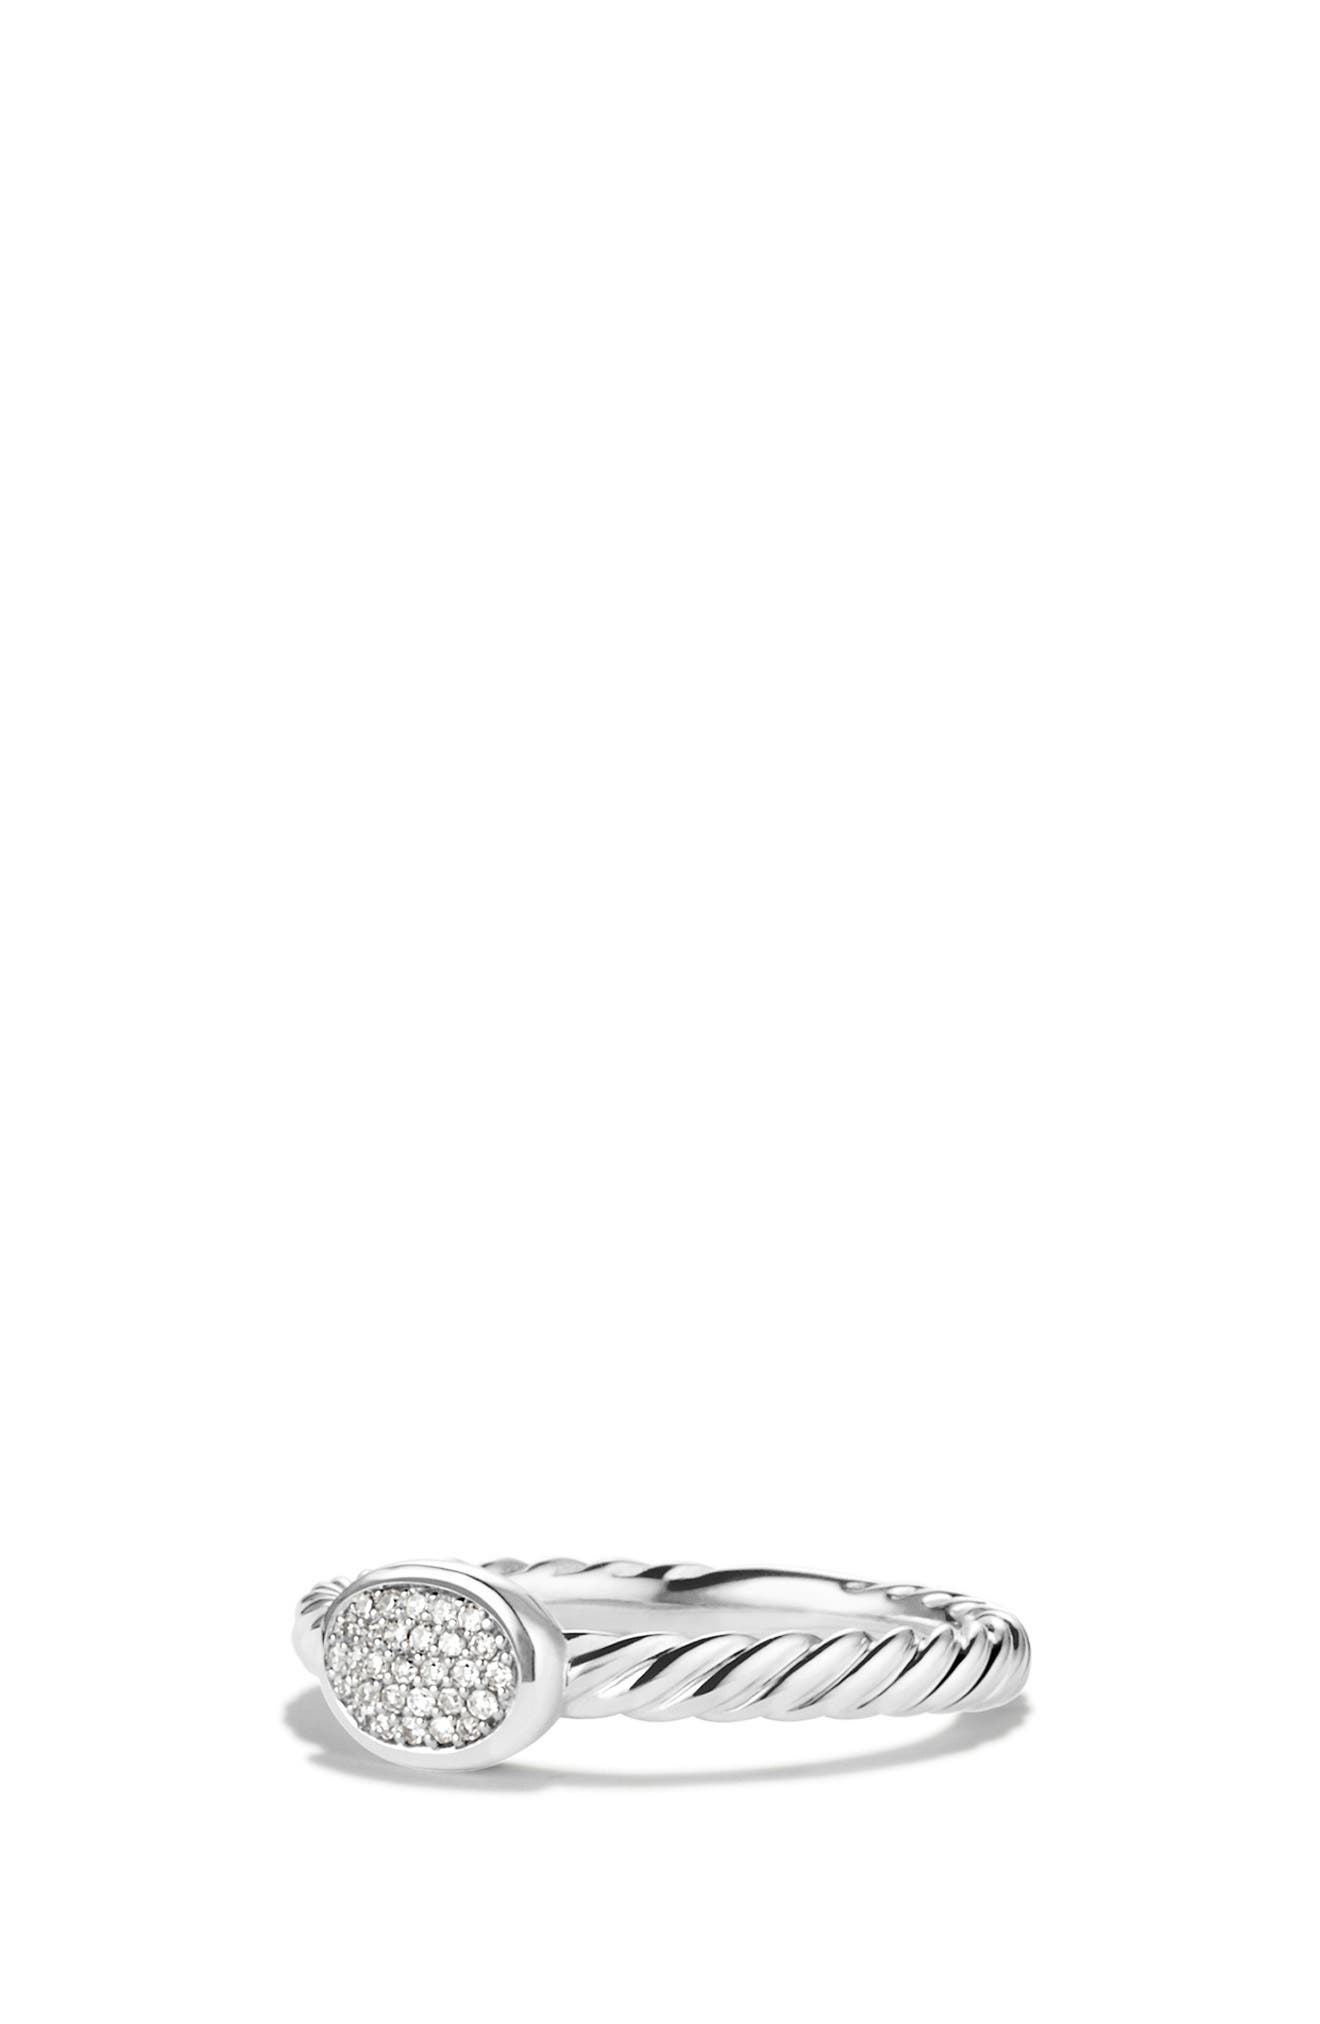 Petite Pavé Oval Ring with Diamonds,                         Main,                         color, 100